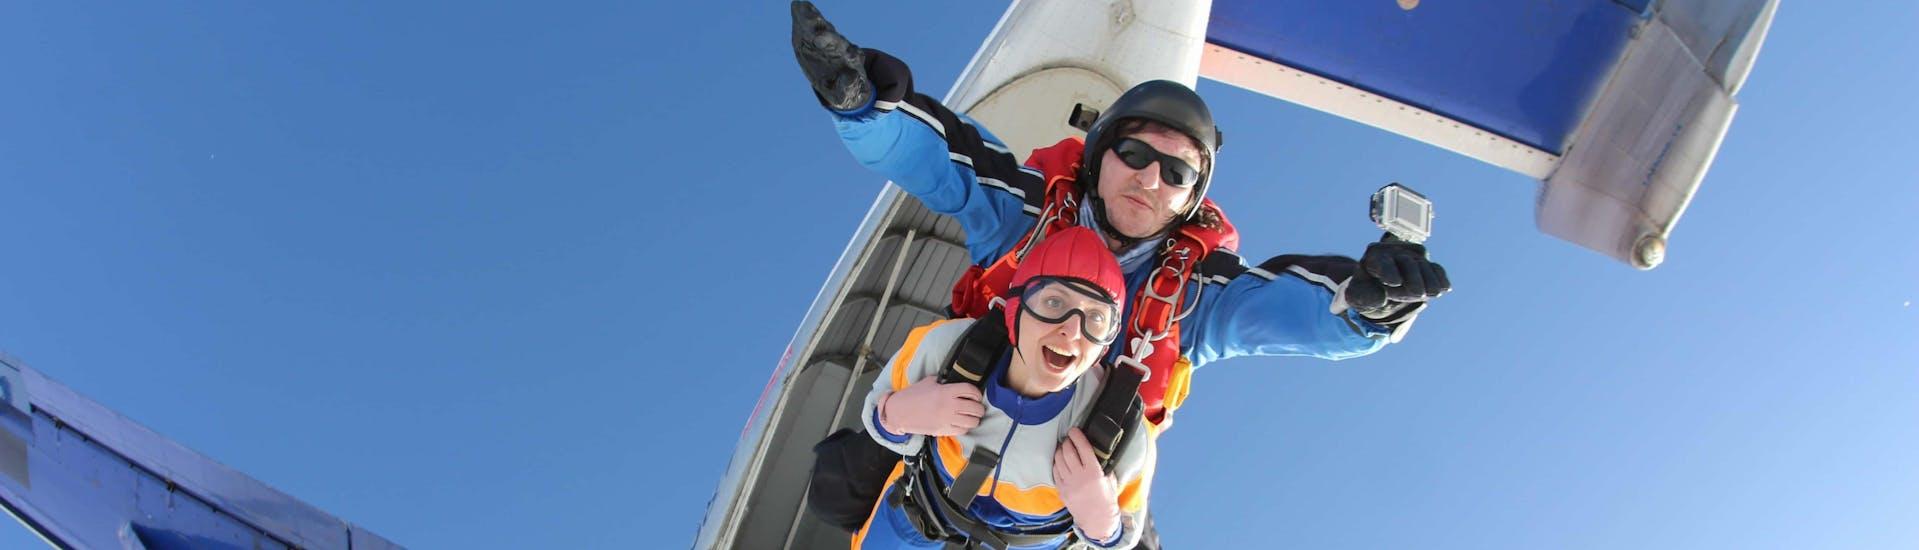 Skydiving (c) Shutterstock